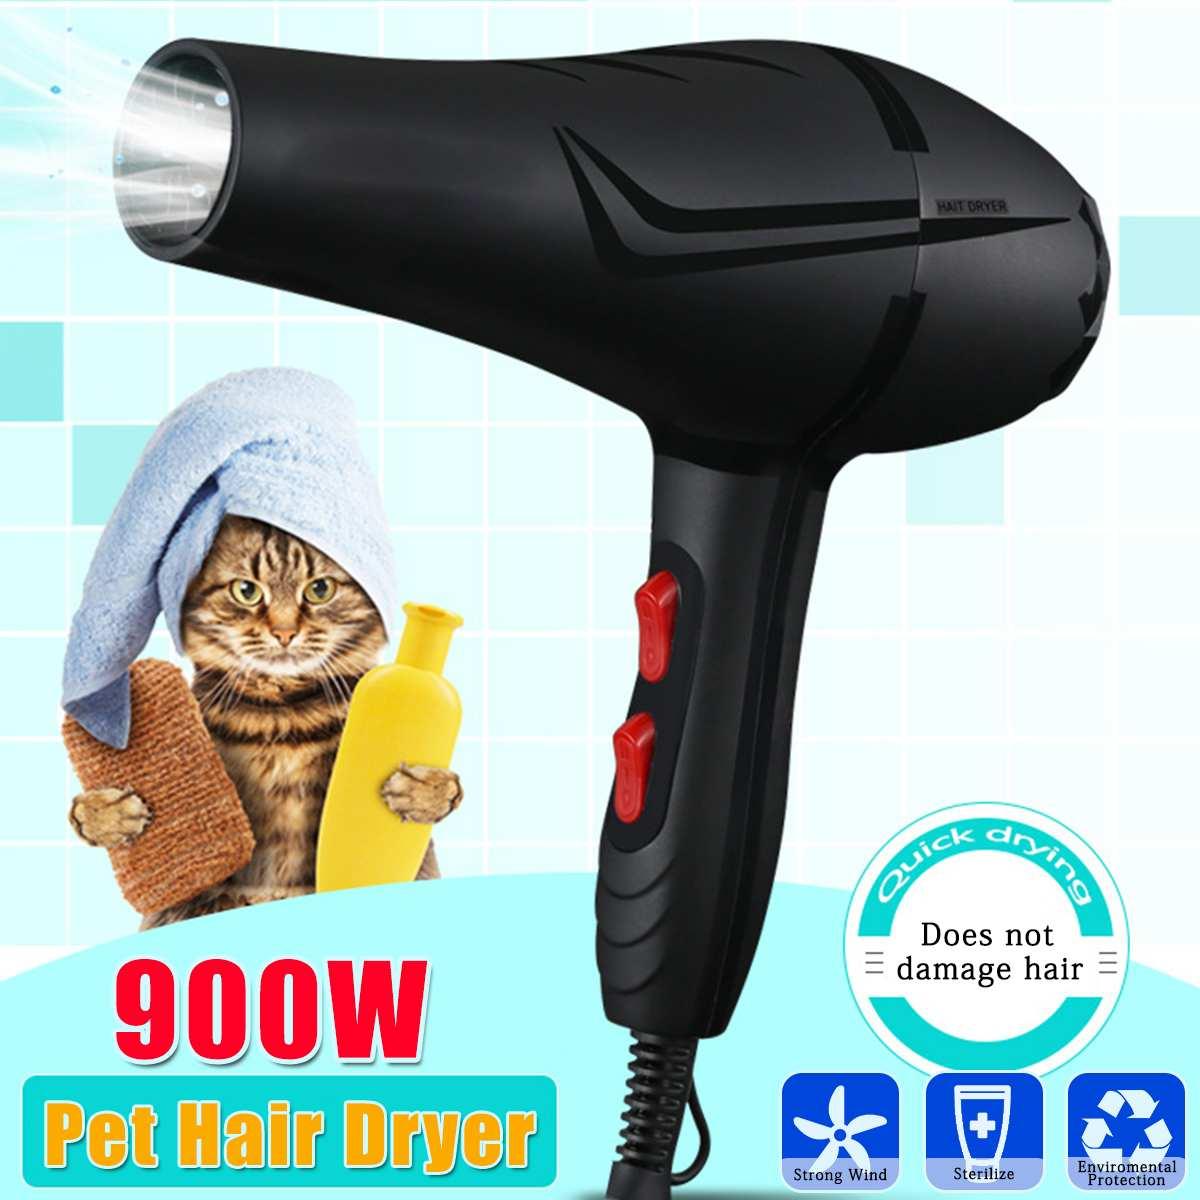 900W Pet Dryer 6 Gear Strong Power Pet Cat Dogs Hair Dryer Fast Blower Hair Dryer Fan Hairdressing Barber Tools